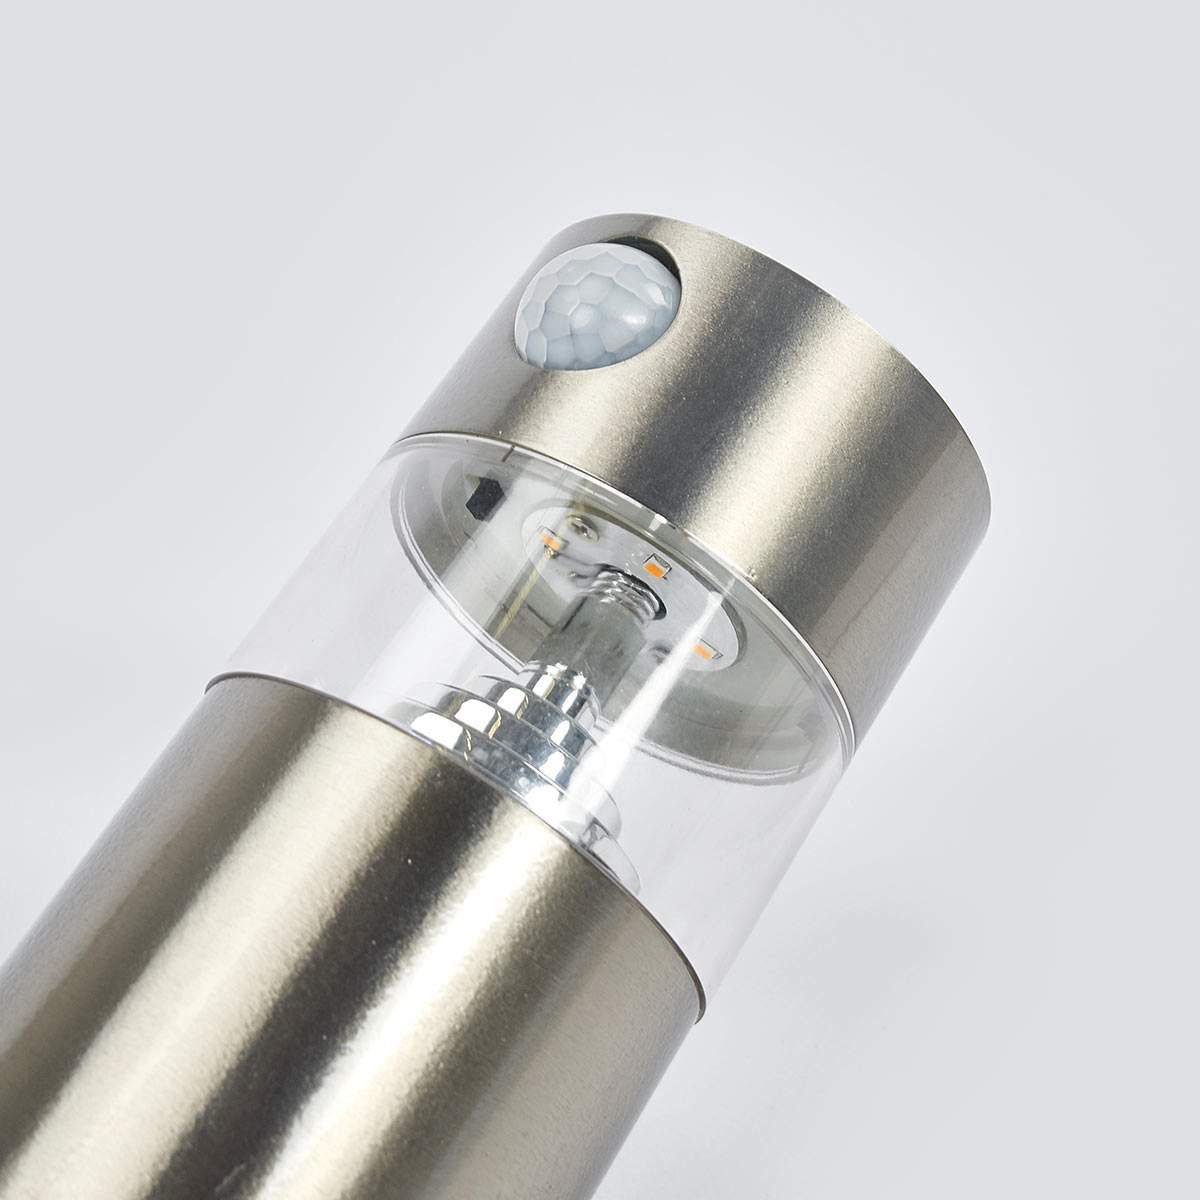 Solar-LED-Wandlampe Kalypso mit Bewegungsmelder, 21,3x7,6x7,6 cm, Edelstahl, silber | #4